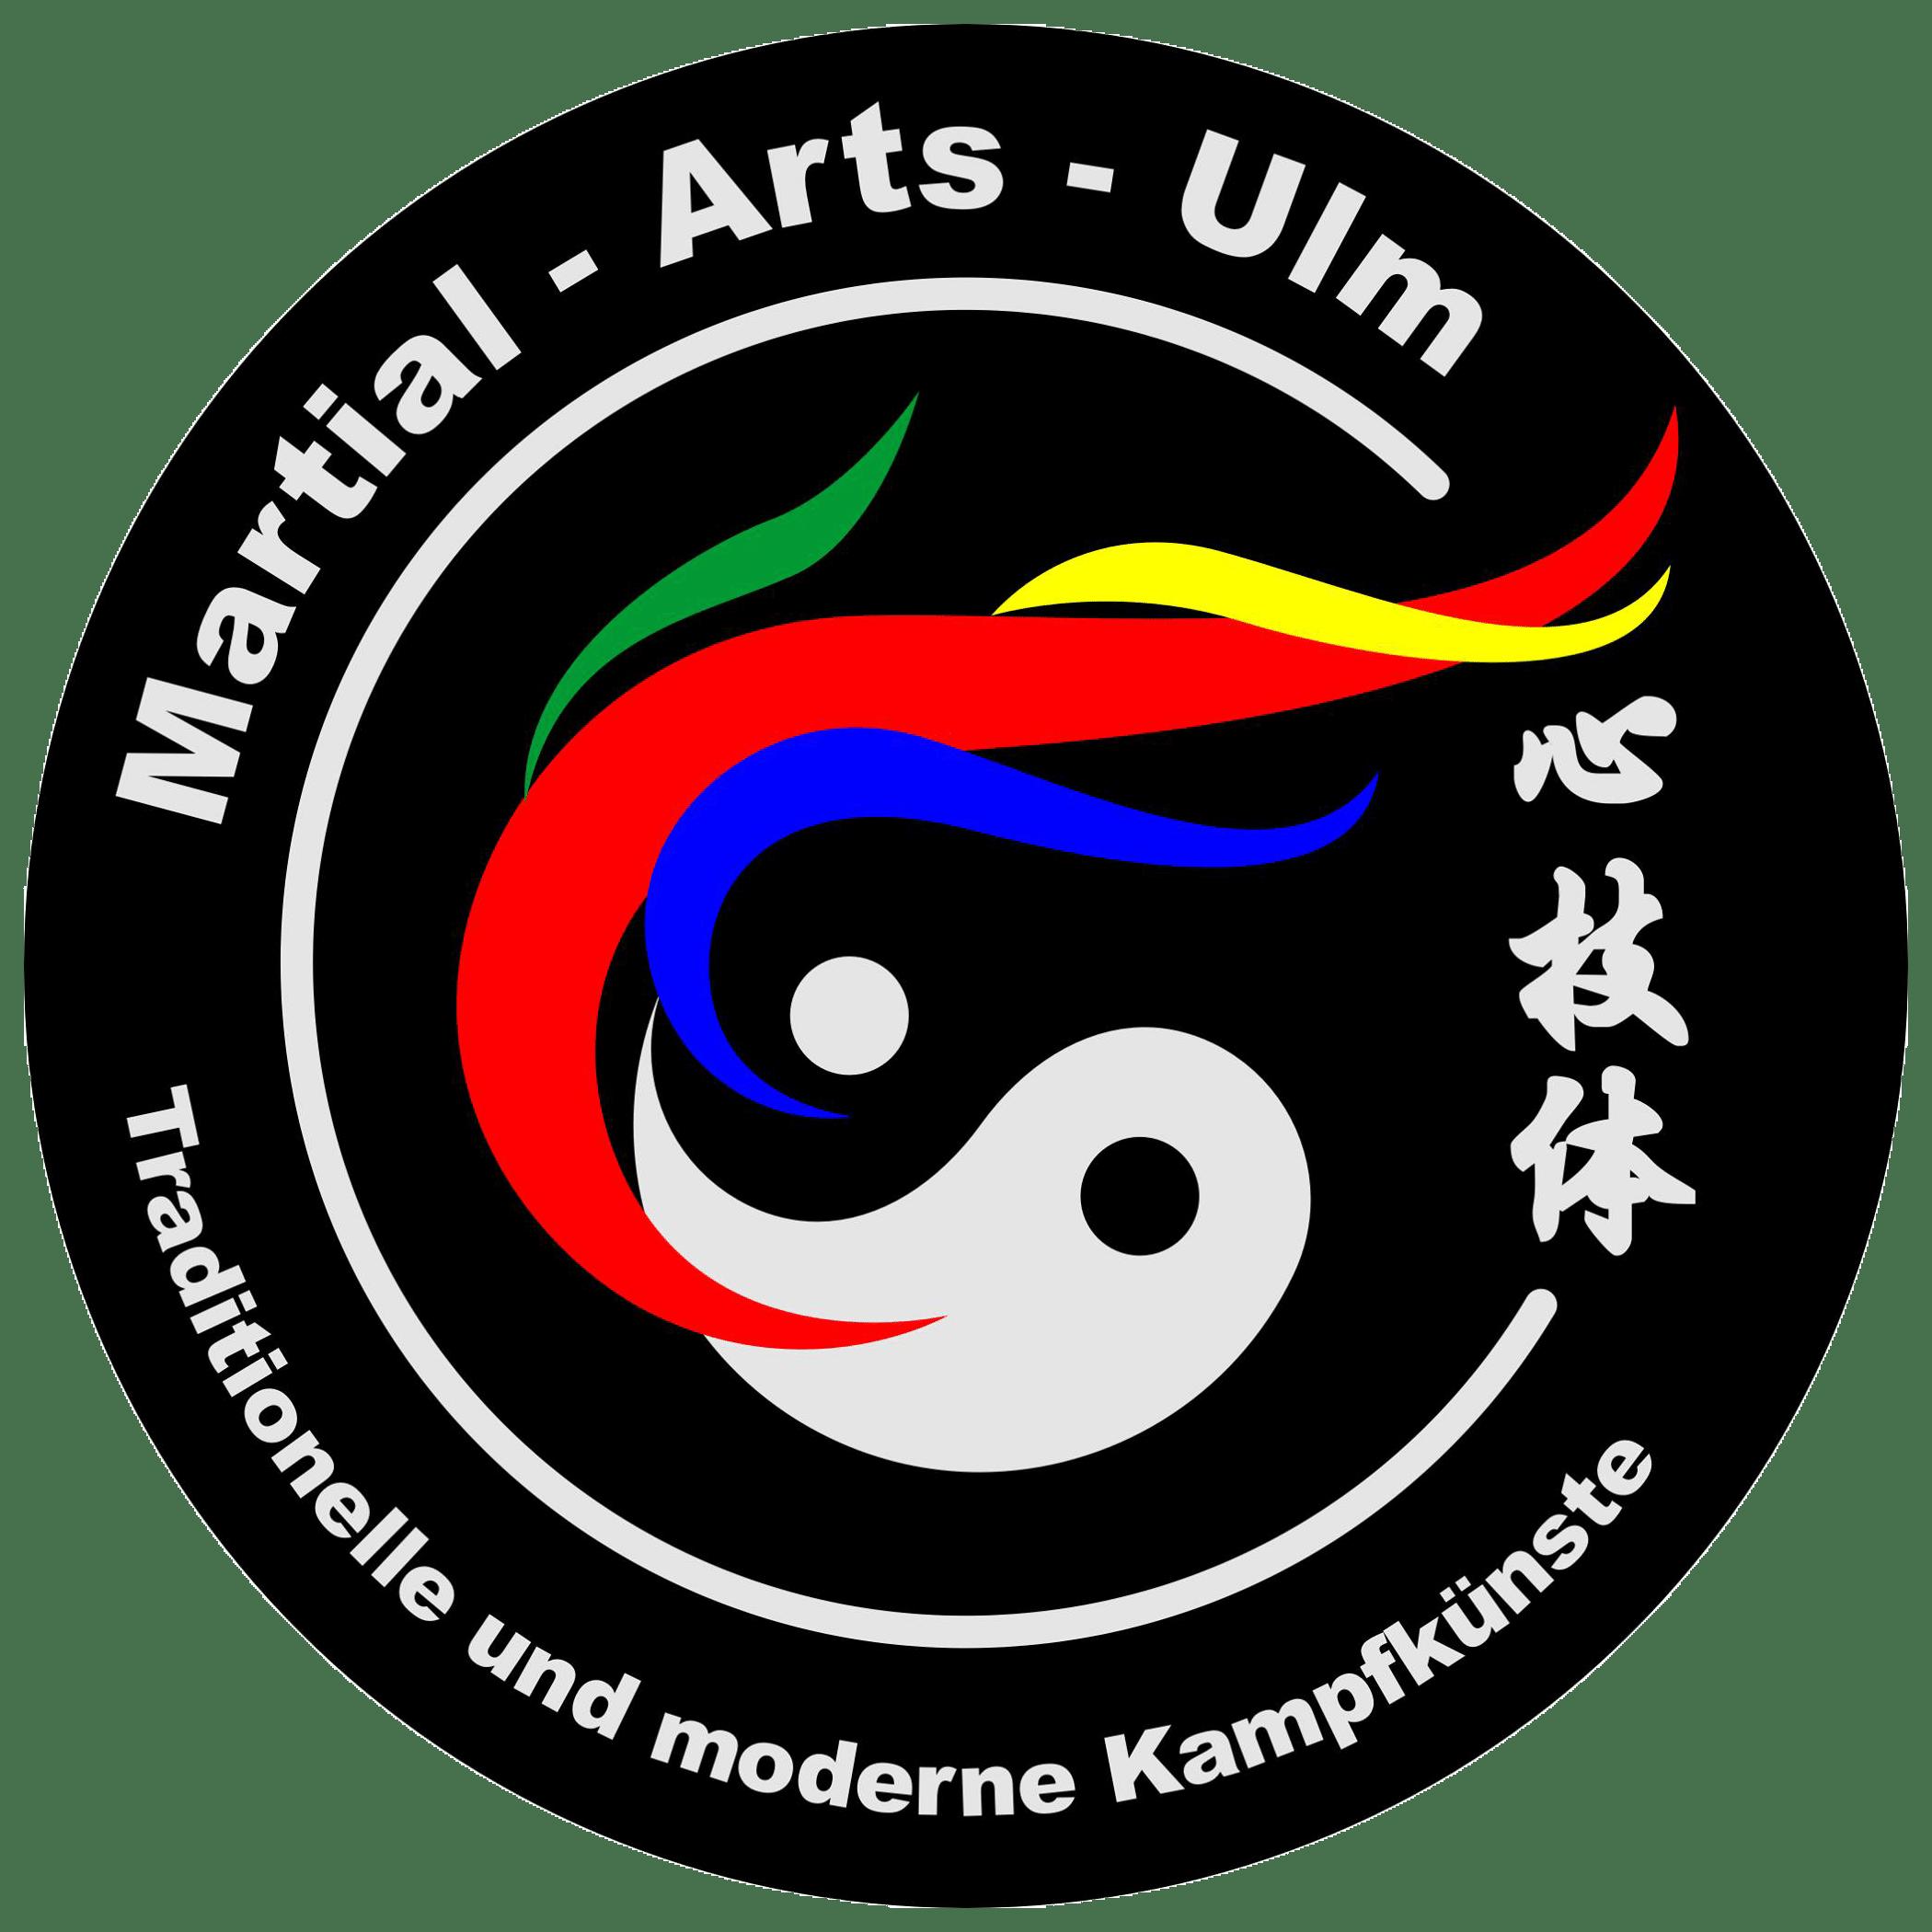 Martial arts Ulm Logo frei